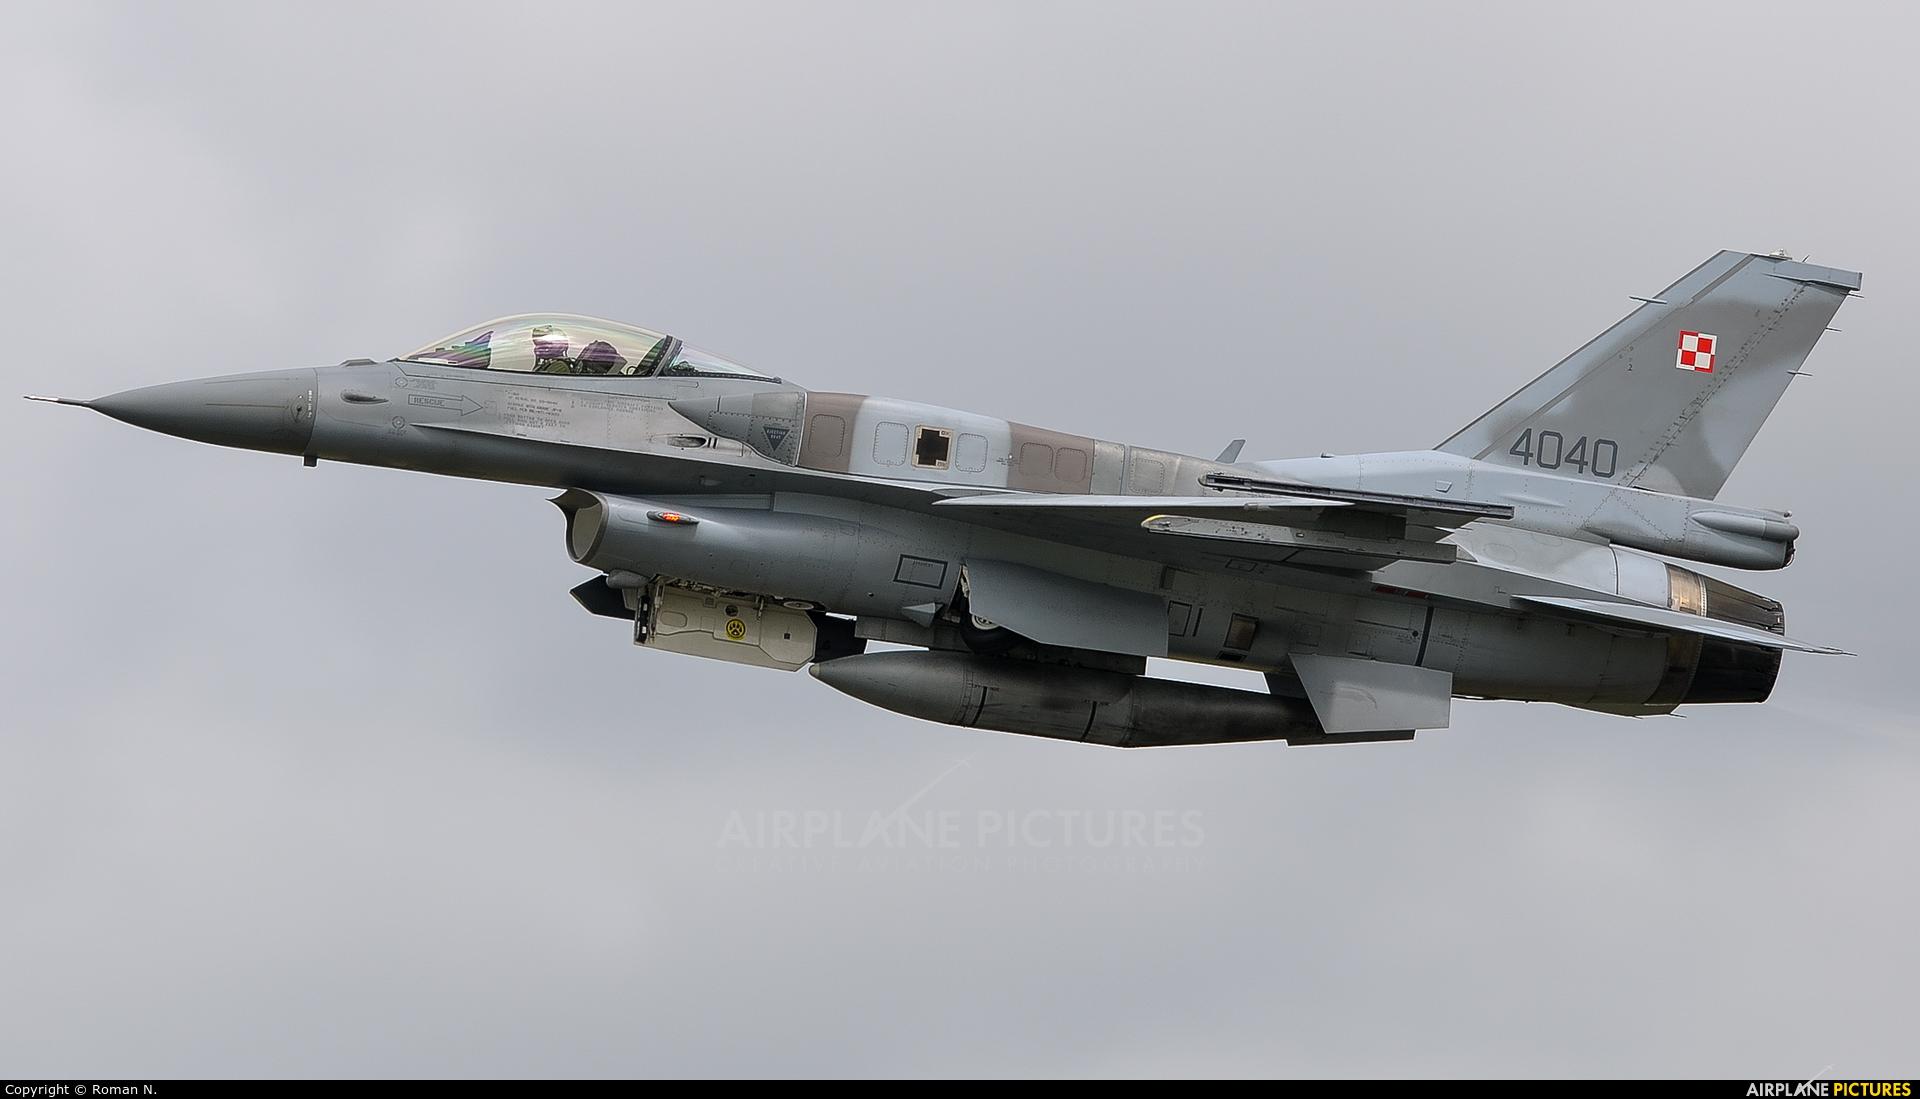 Poland - Air Force 4040 aircraft at Schleswig-Jagel